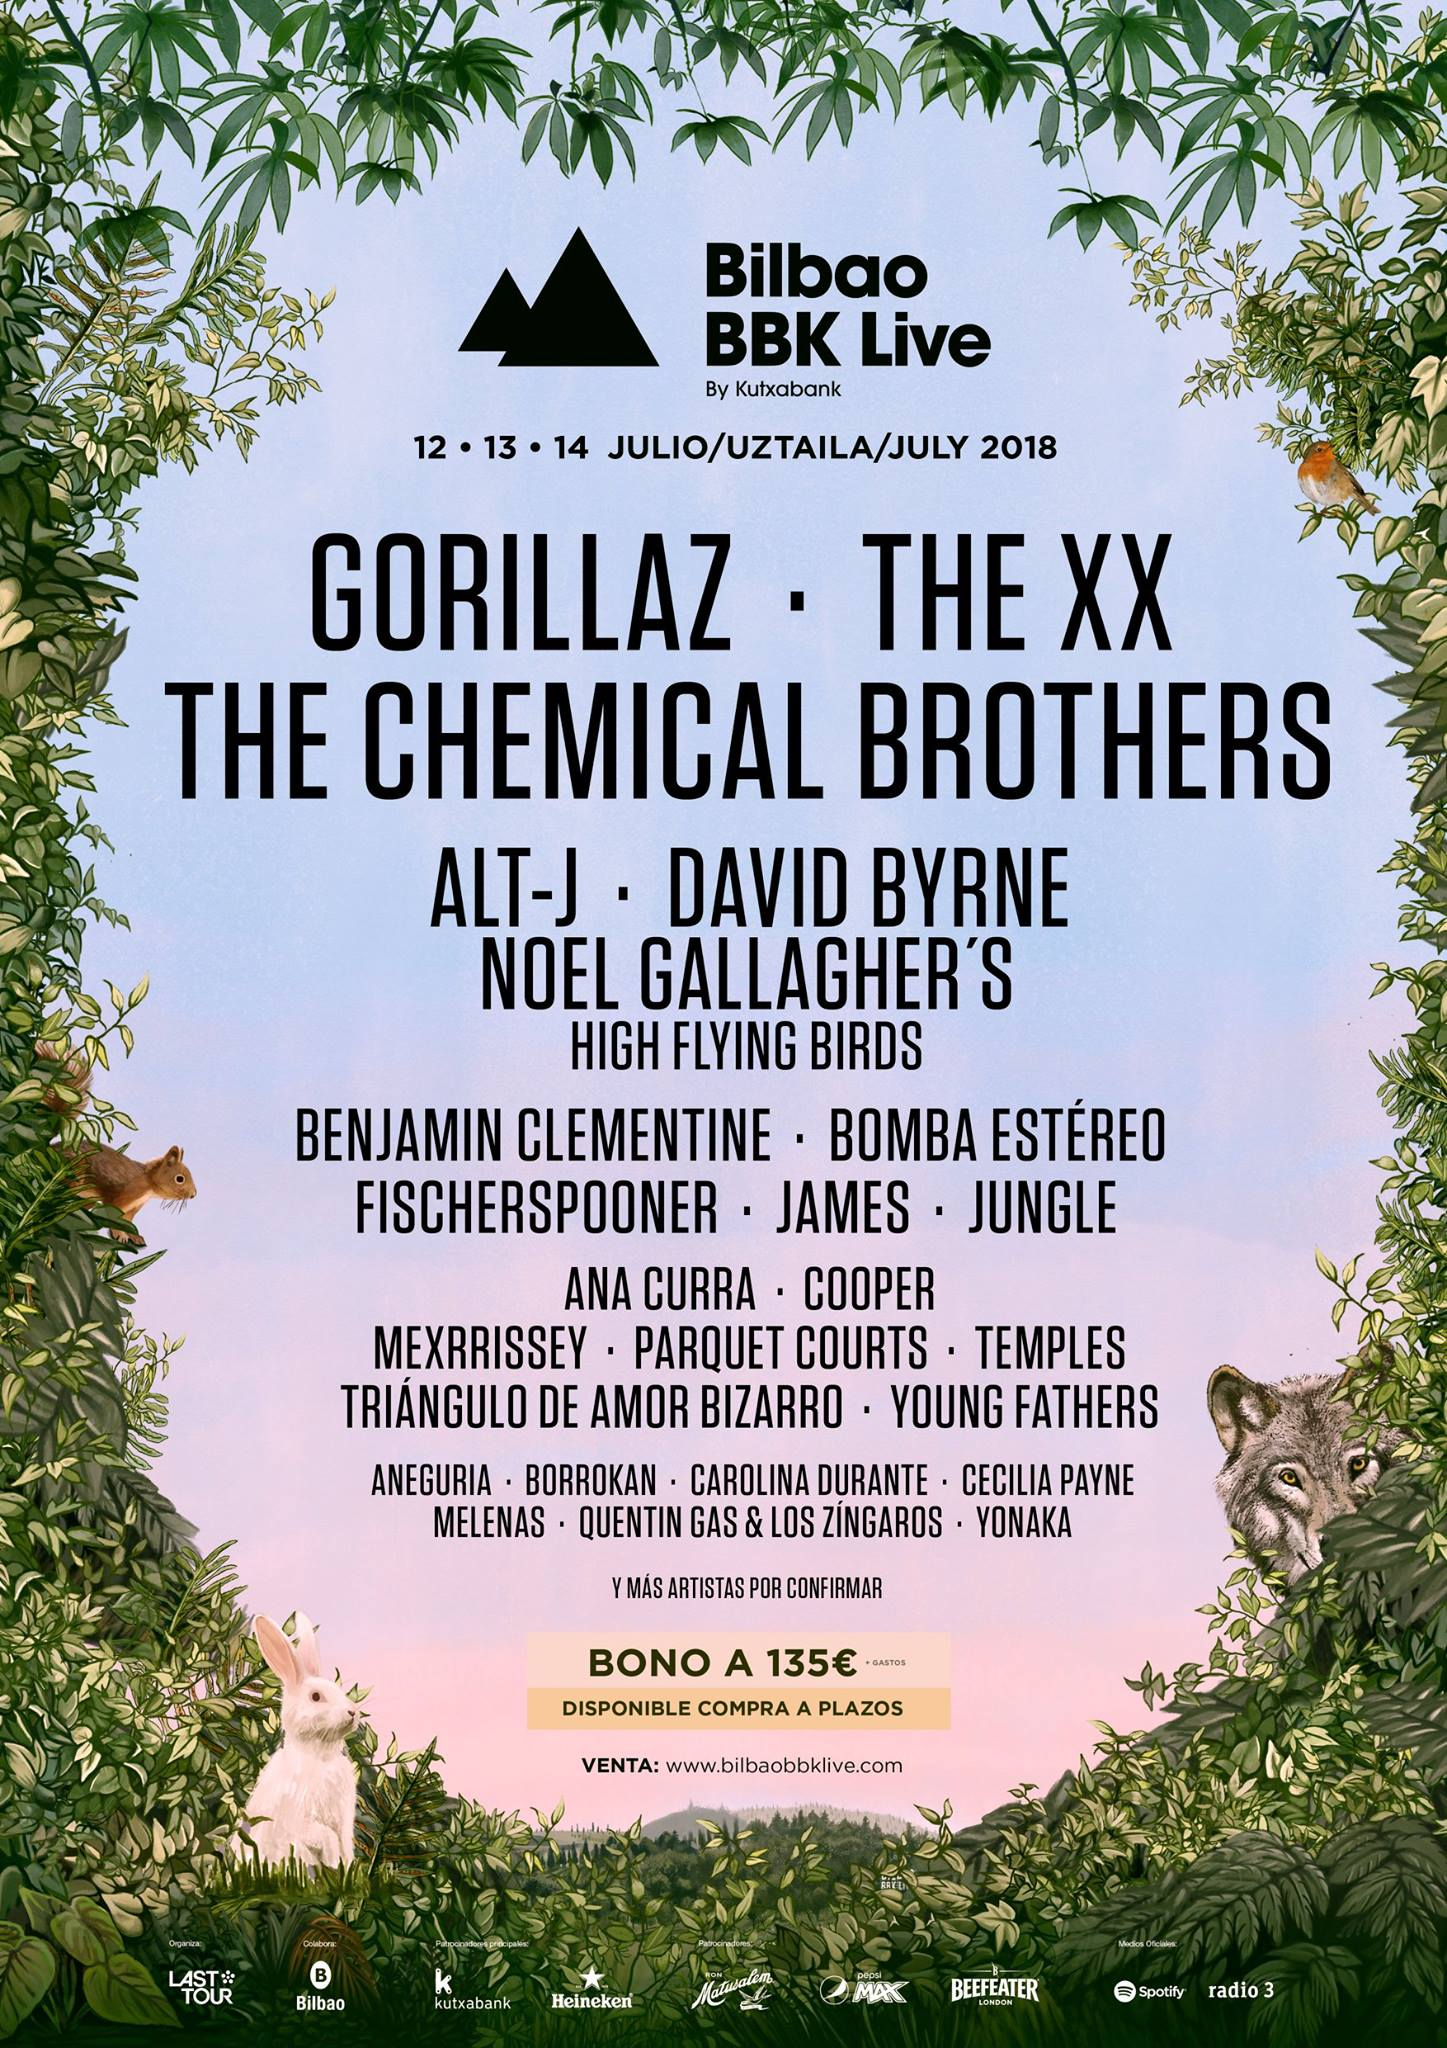 Bilbao-bbk-live-2018-02